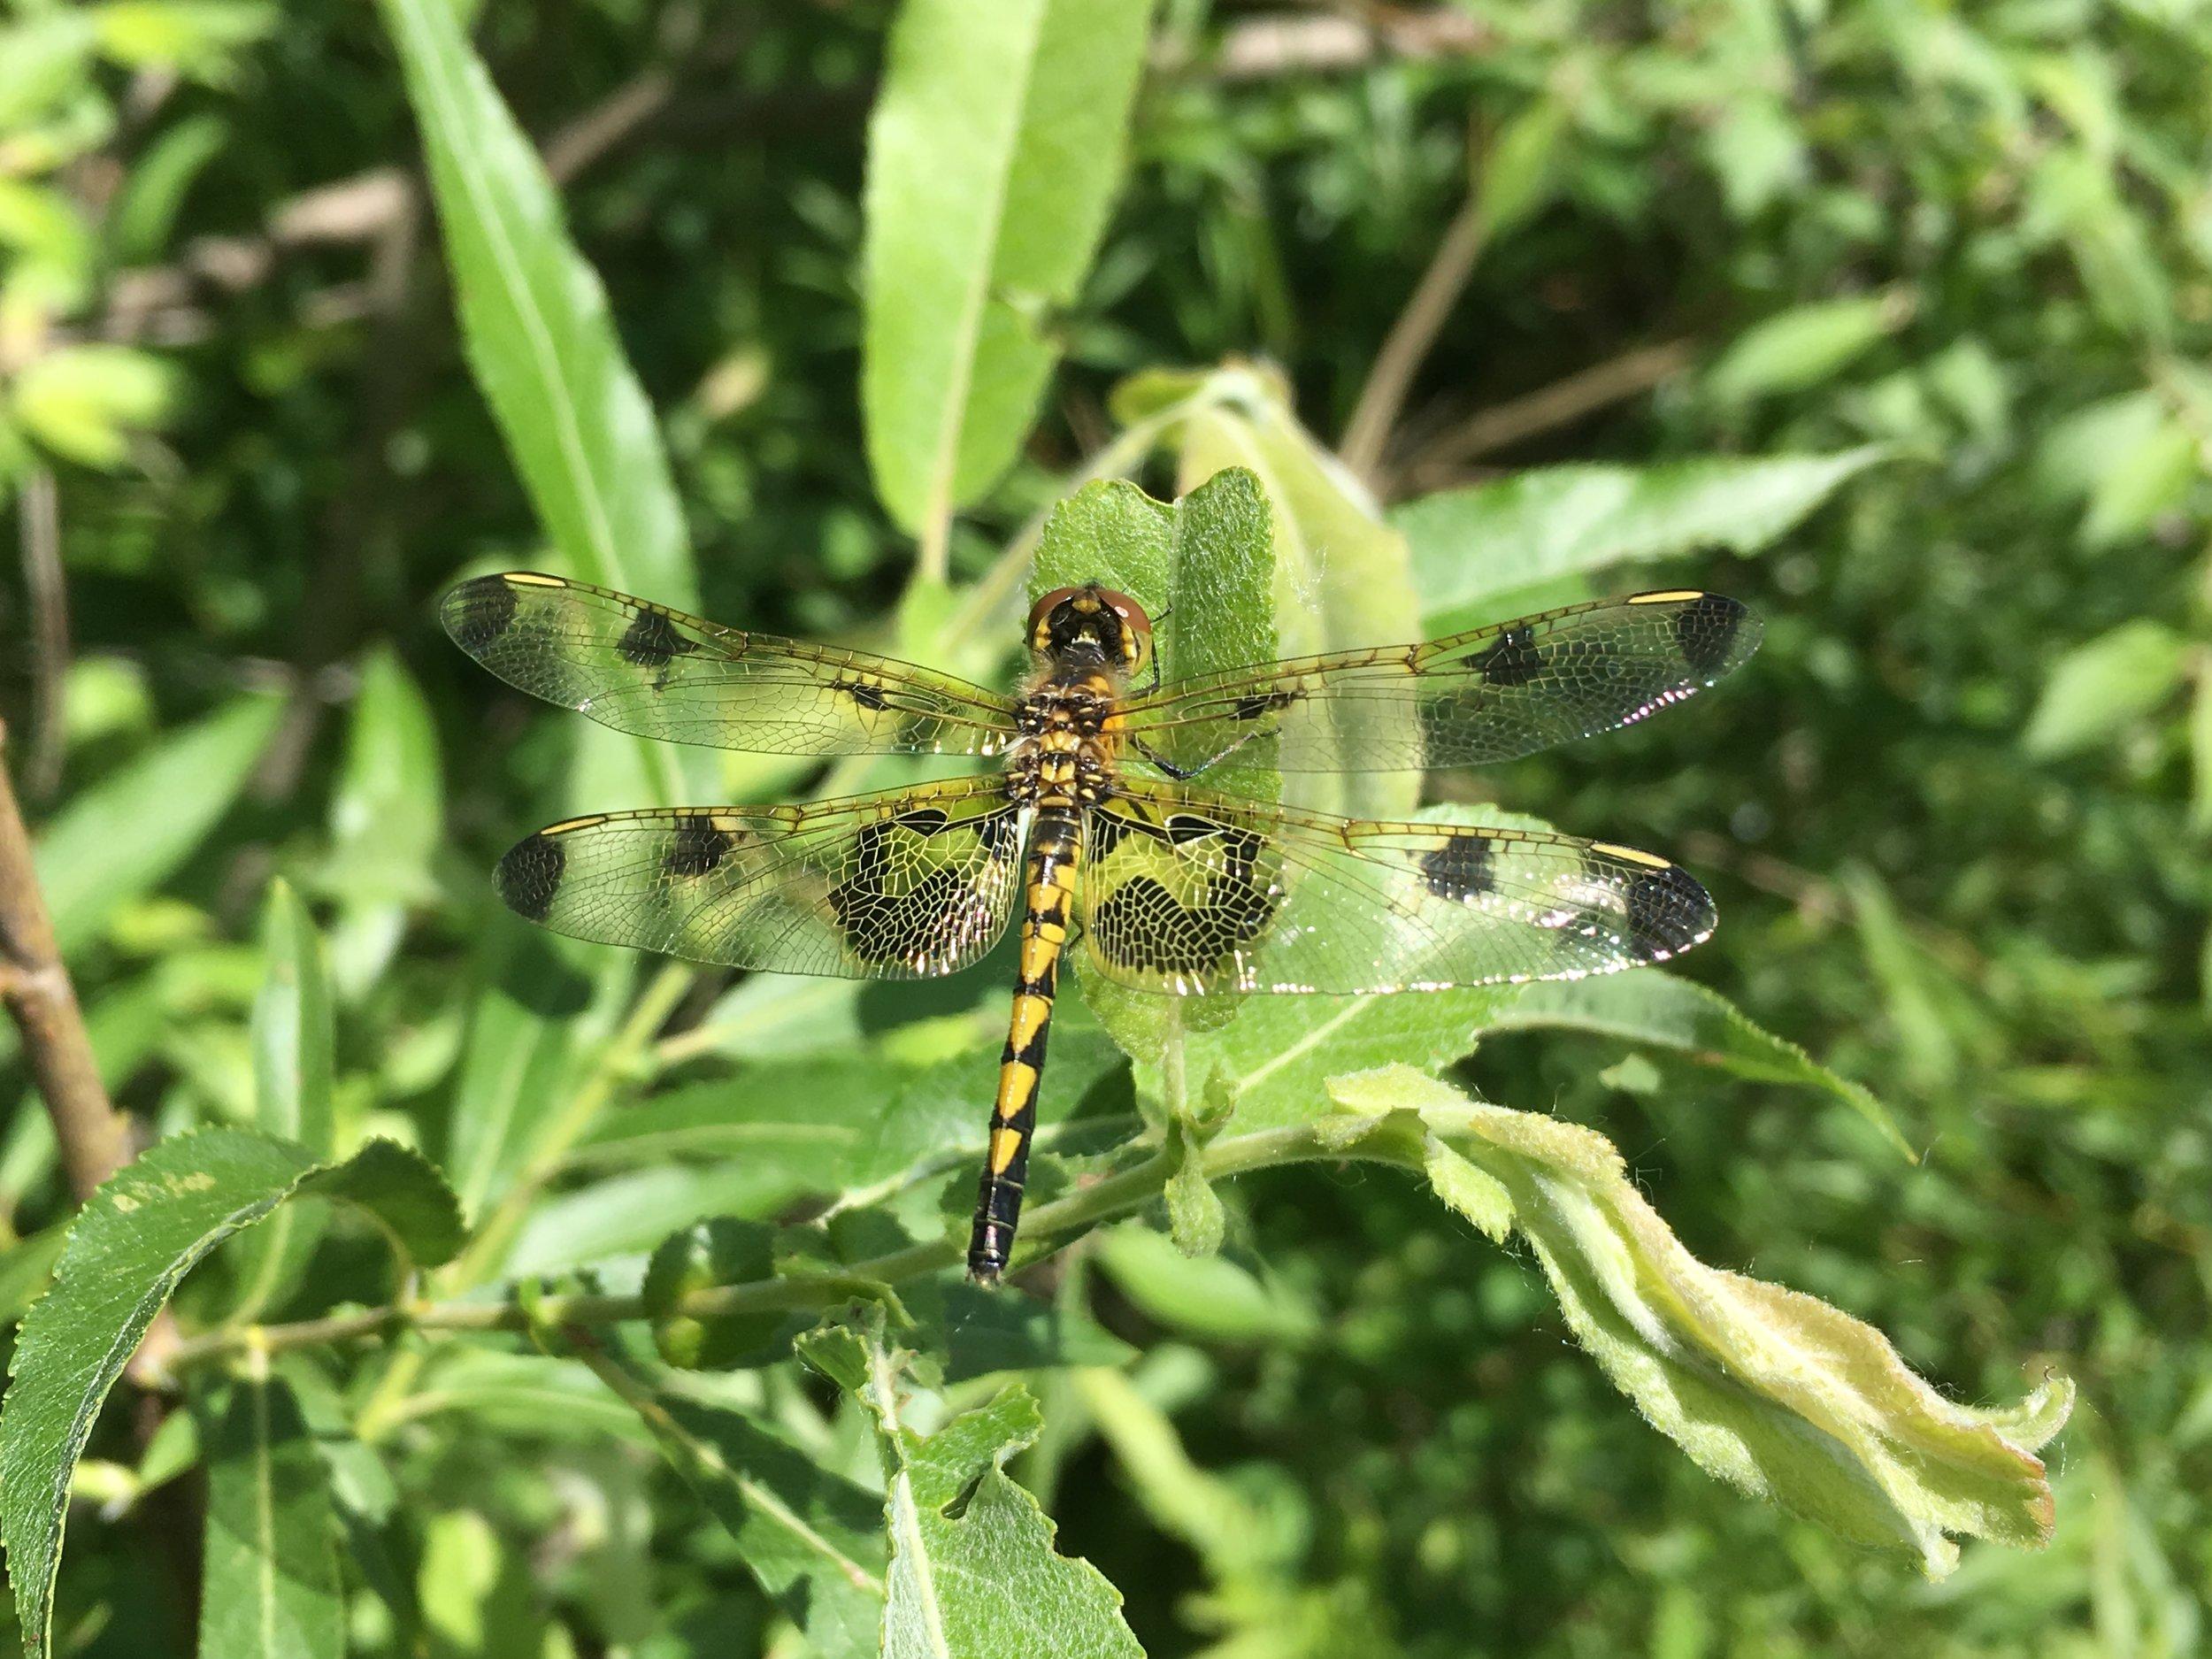 Calico Pennant - Spray Lake Watersports Park - Jun 8/18